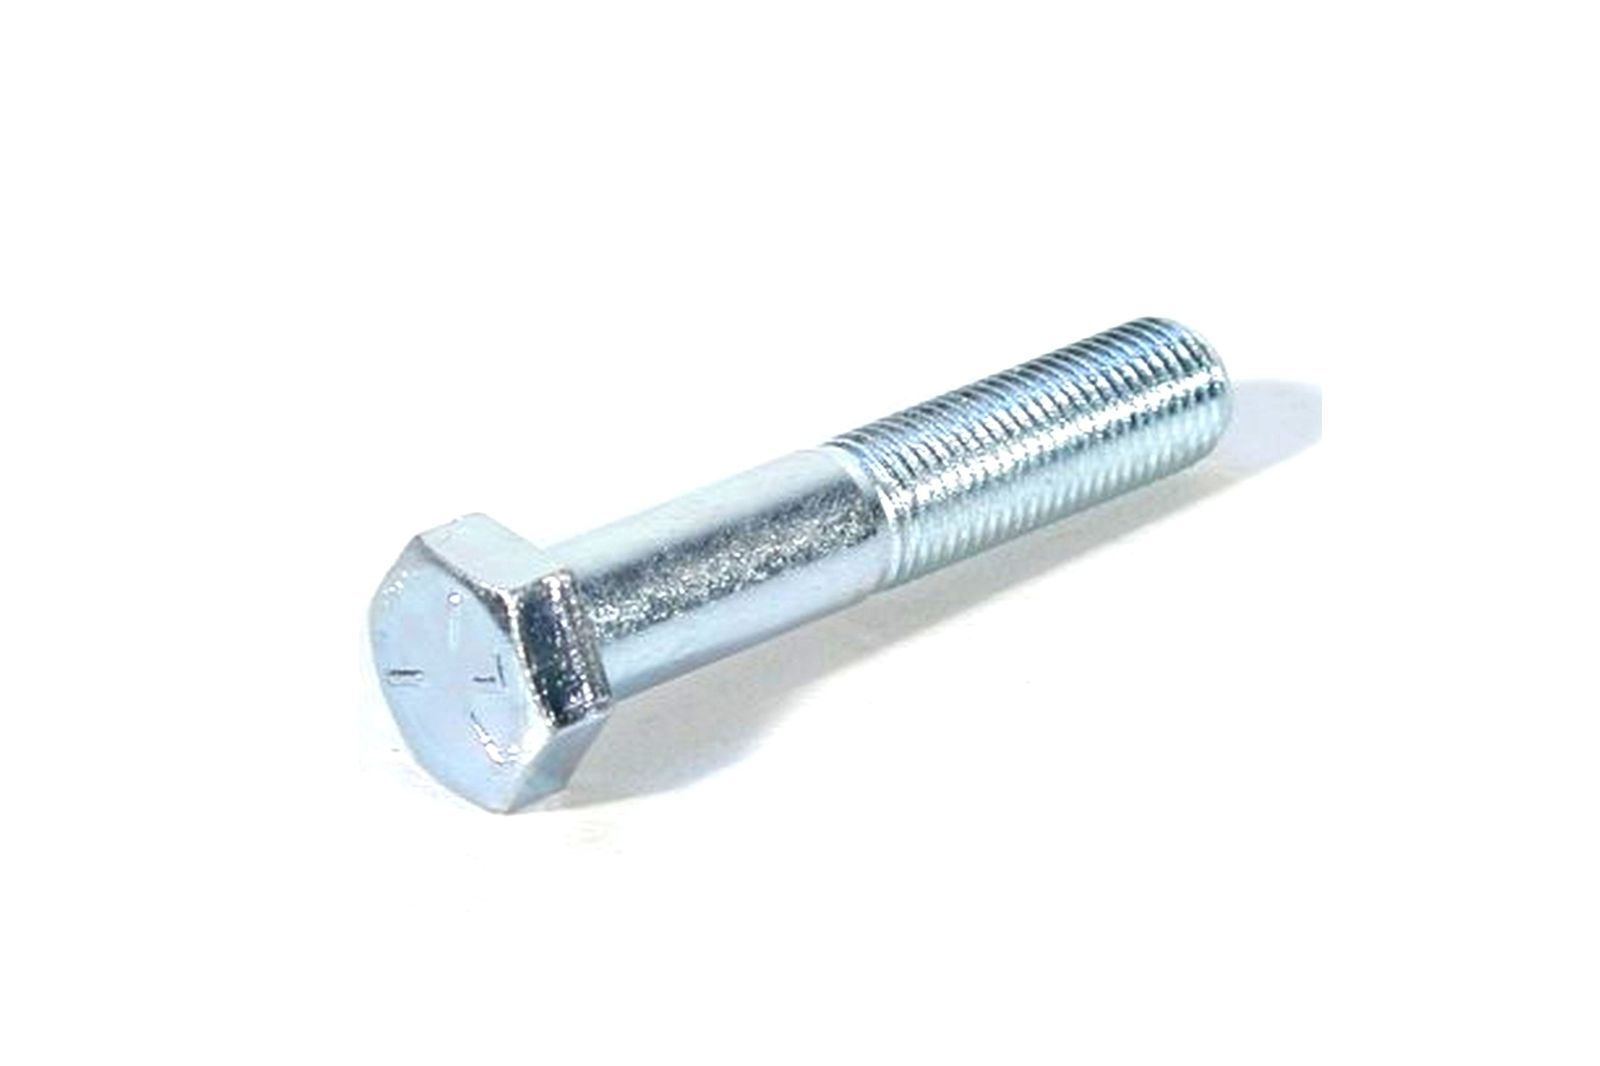 "#1002-41 Bolzen UNF 3/8"" x 2 1/8"", BH606171"